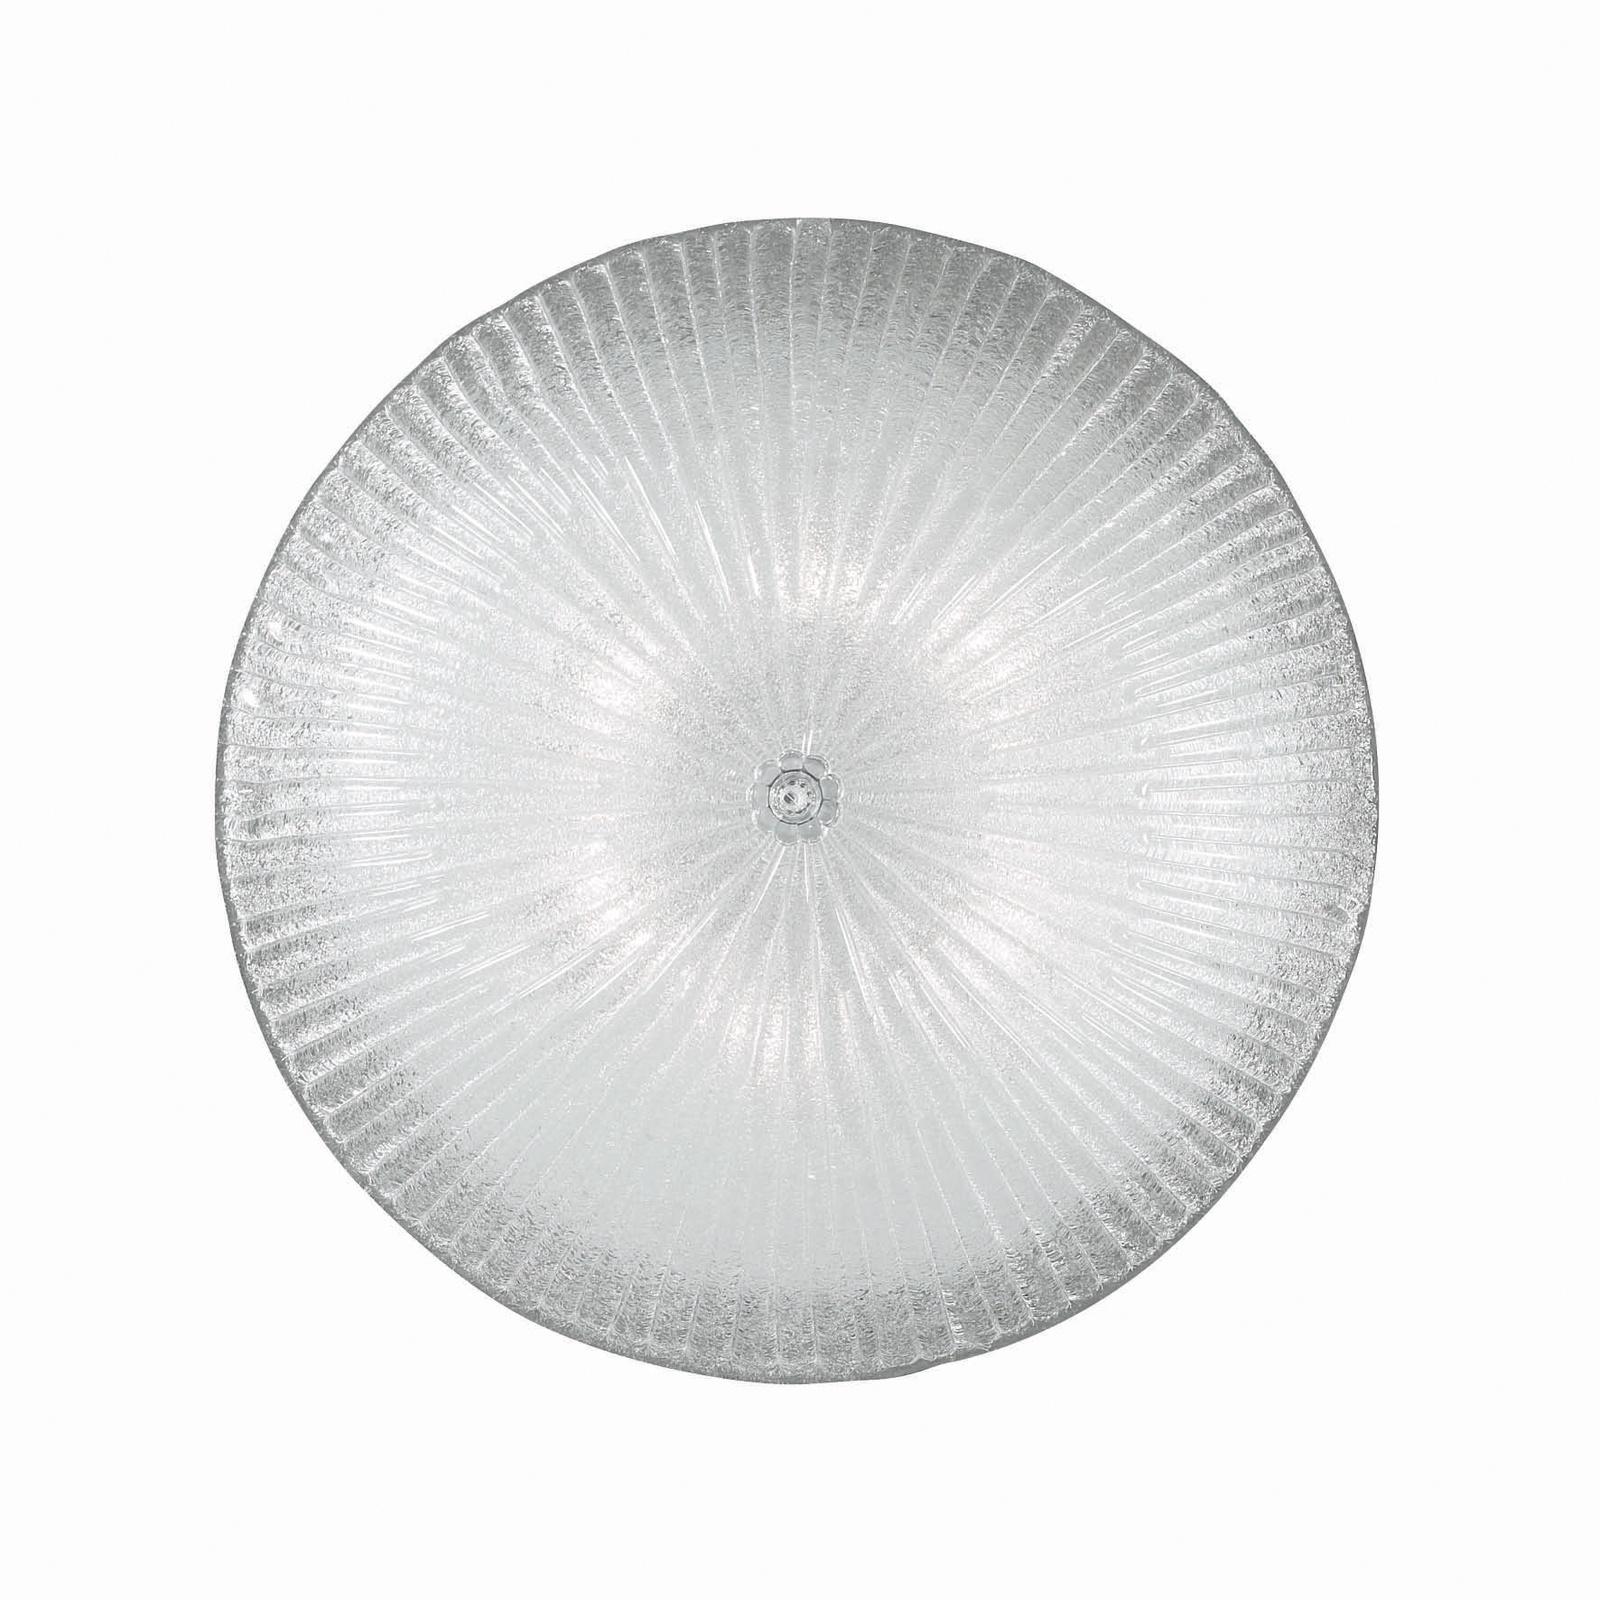 Потолочный светильник Ideal Lux PL6 TRASPARENTE светильник ideal lux corallo corallo pl6